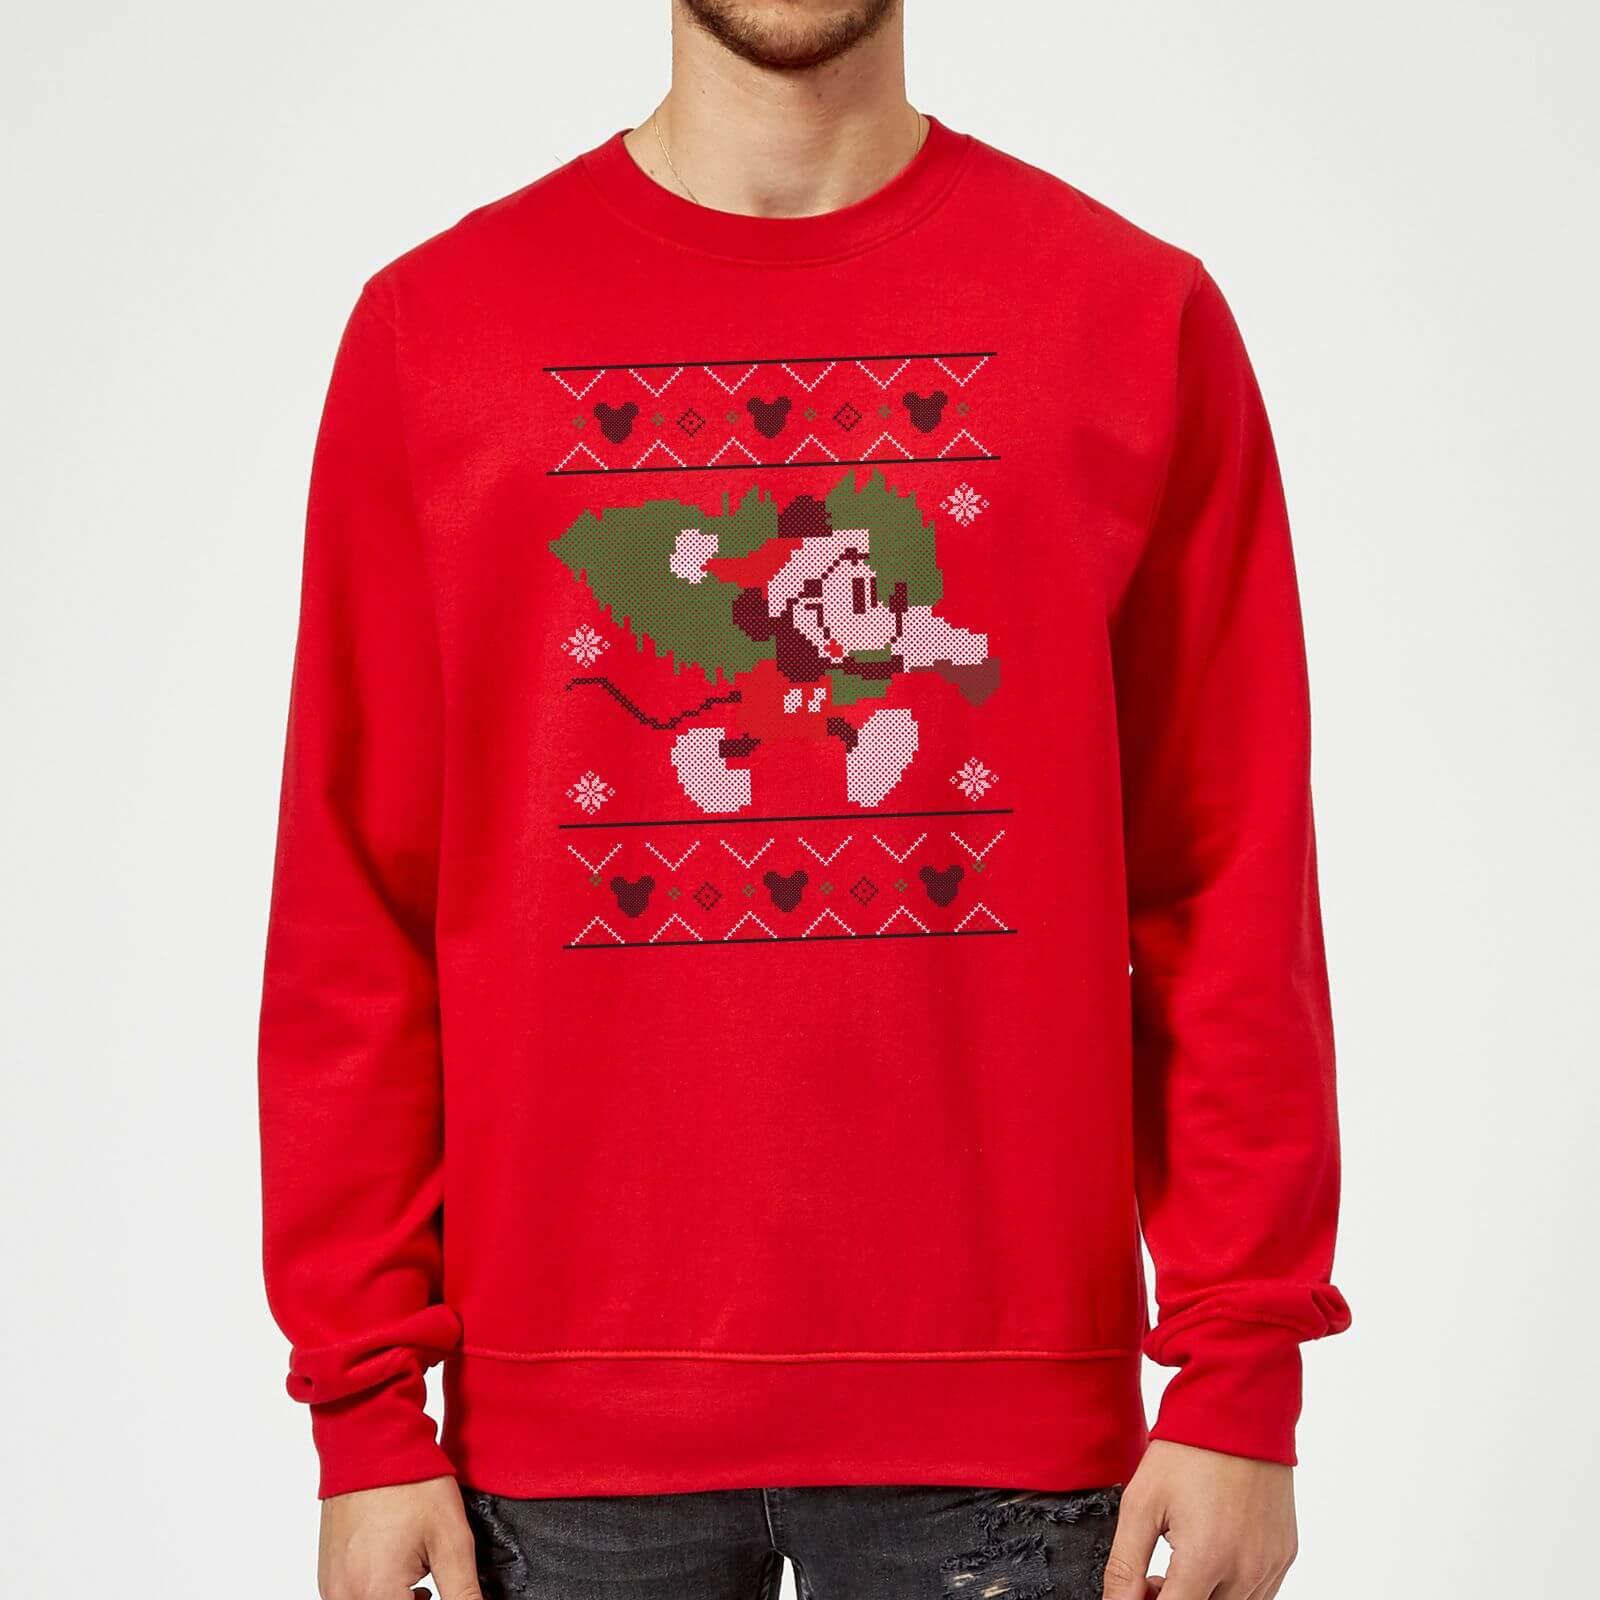 Disney Mickey Mouse Christmas Tree Mickey Red Christmas Sweatshirt My Geek Box